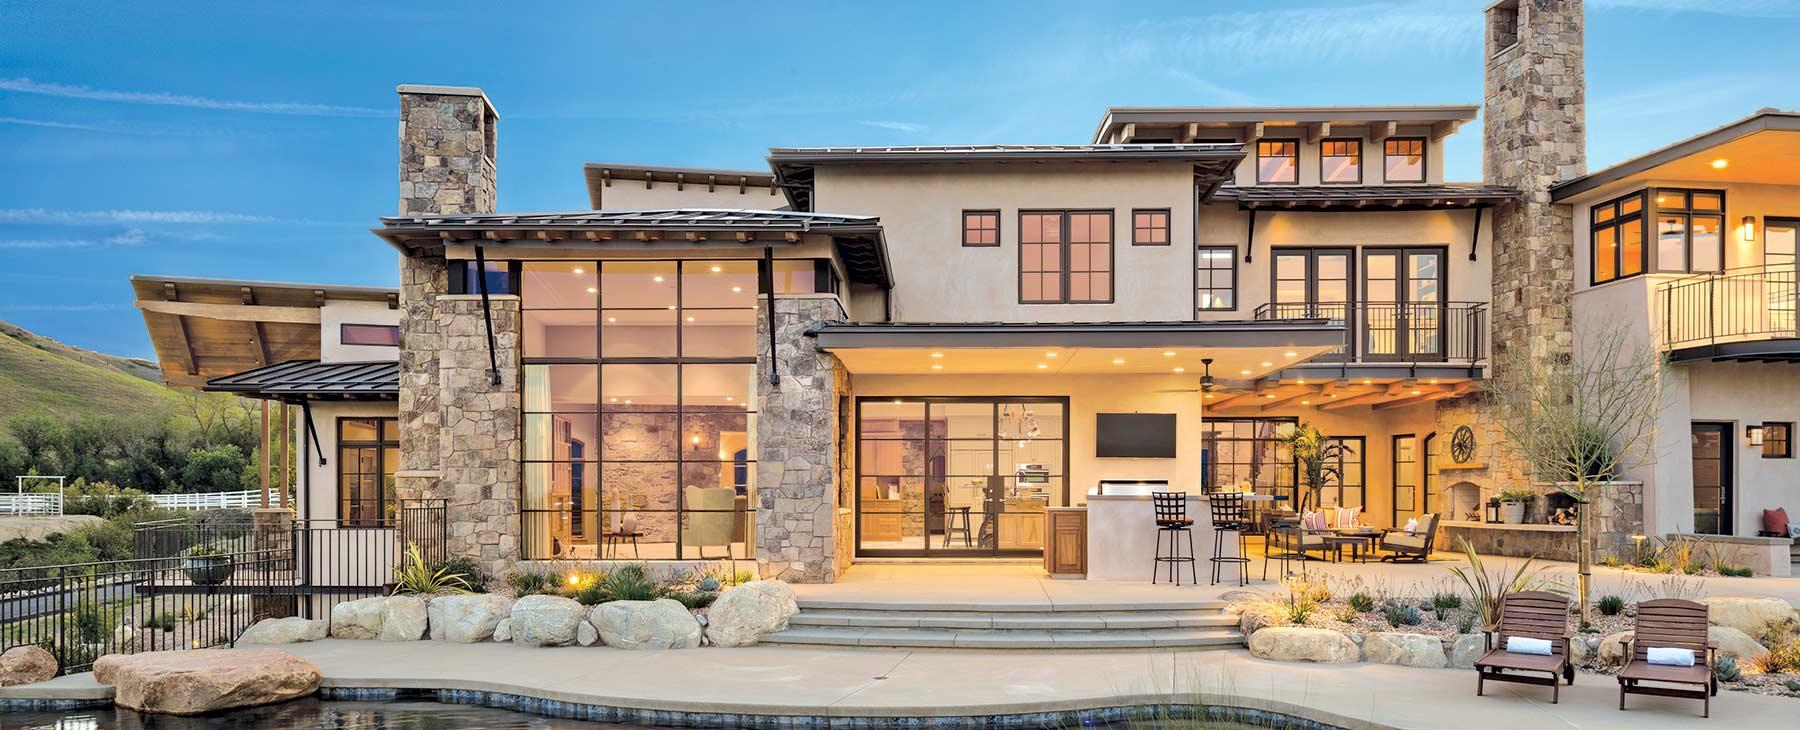 HartmanBaldwin Custom Home Builder